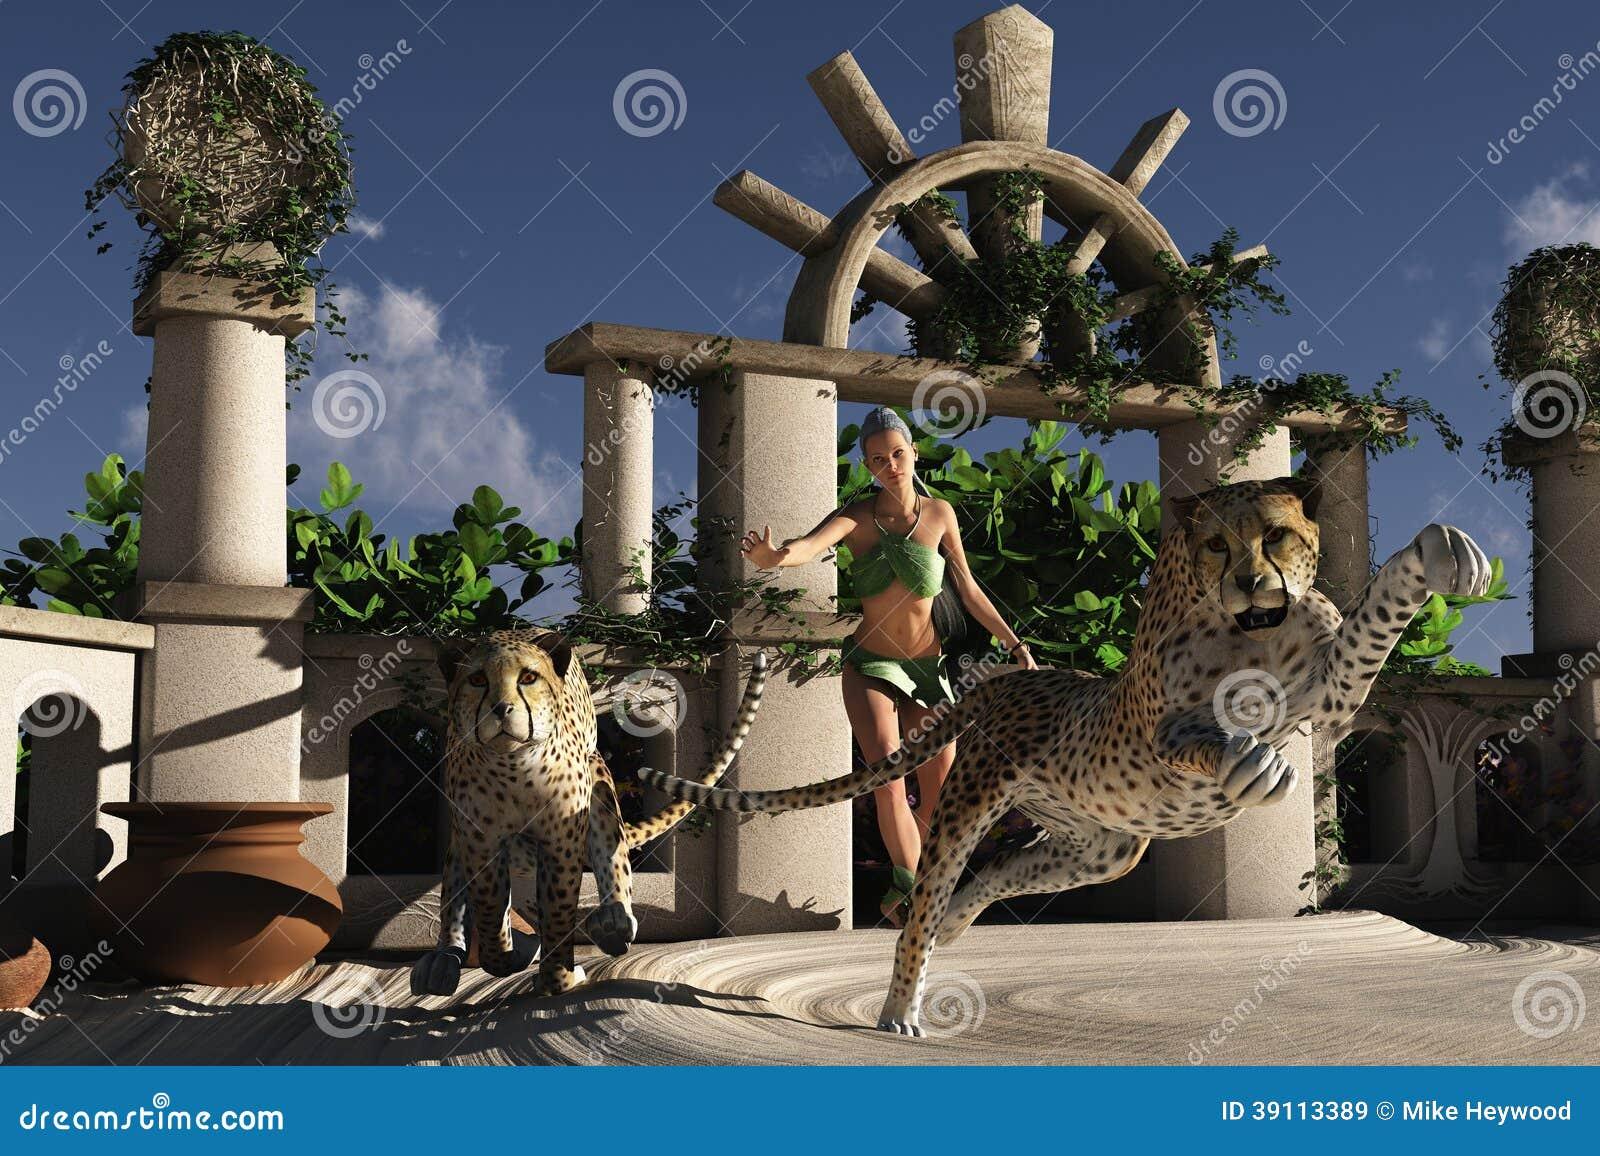 Wildernismeisje met jachtluipaarden